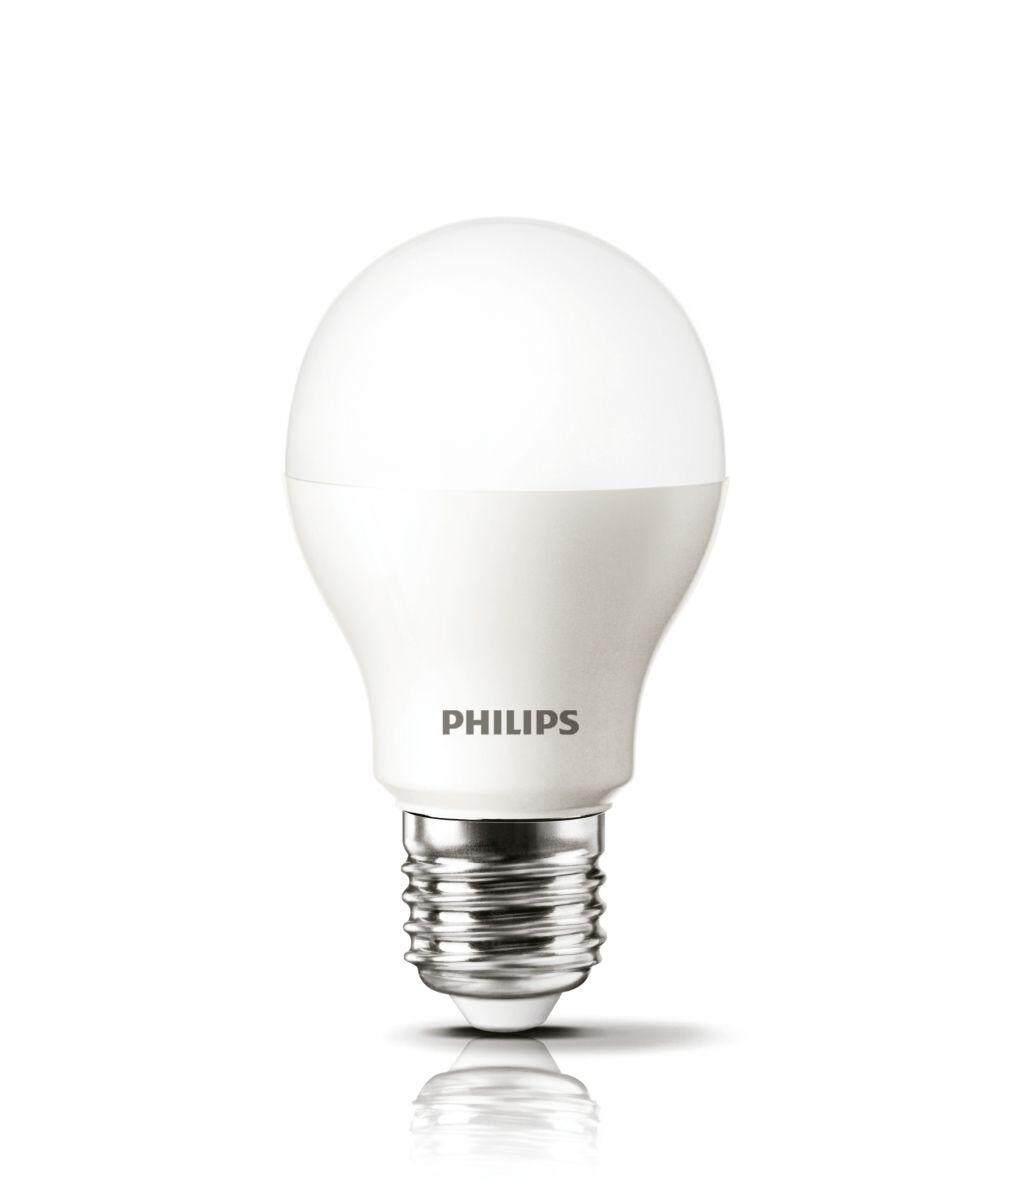 PHILIPS LED Bulb 10.5-85W E27 3000K 230V A60